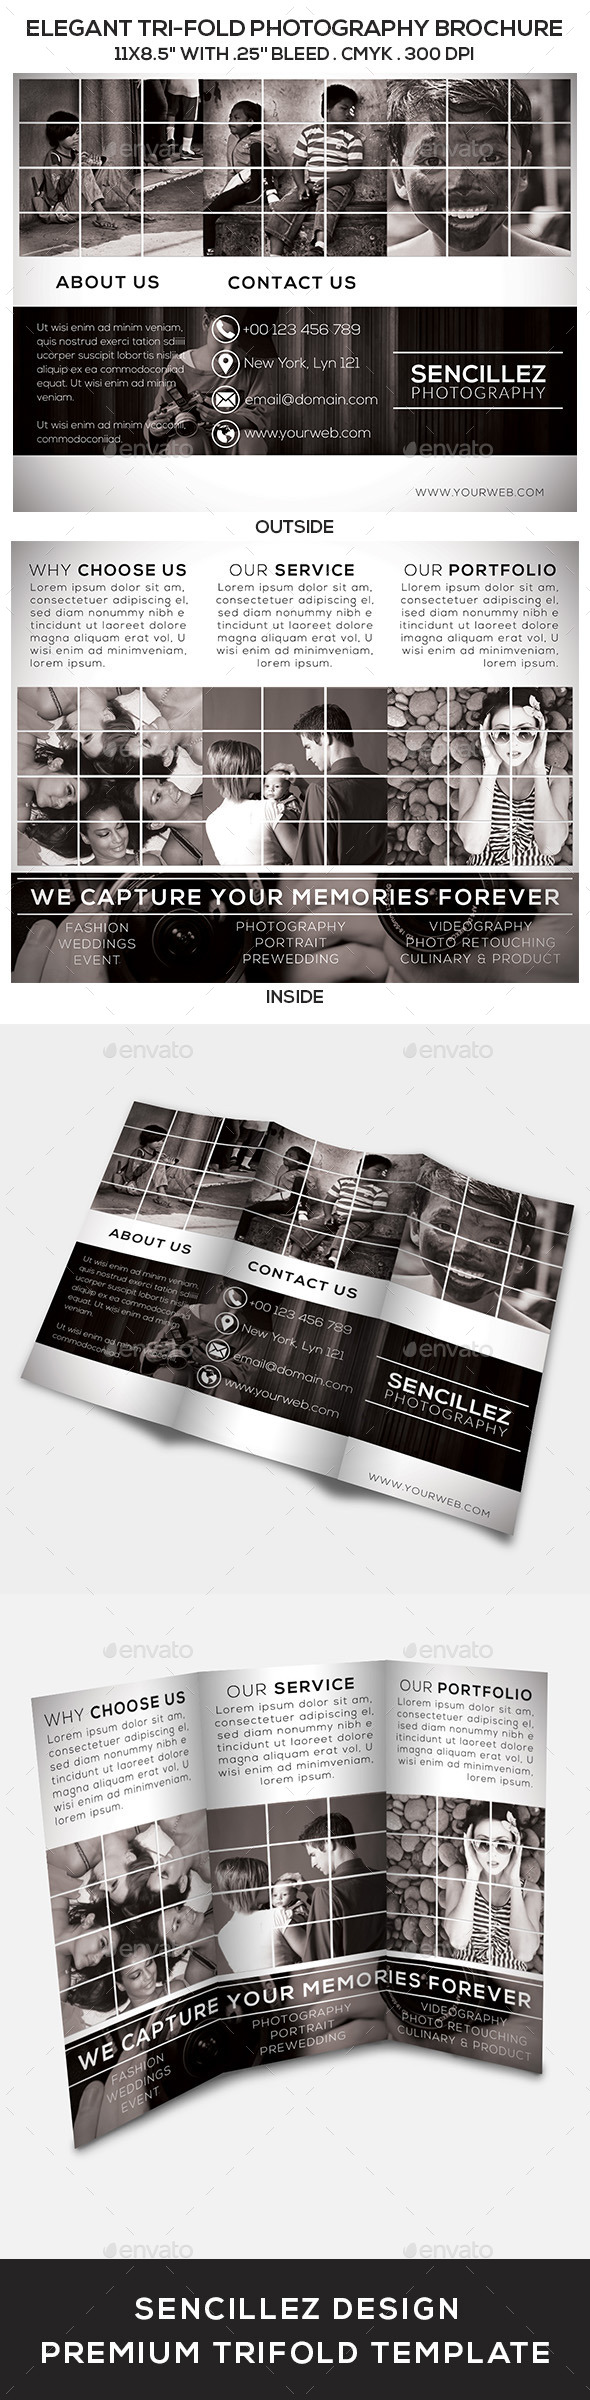 Elegant Tri-Fold Photography Brochure - Corporate Brochures